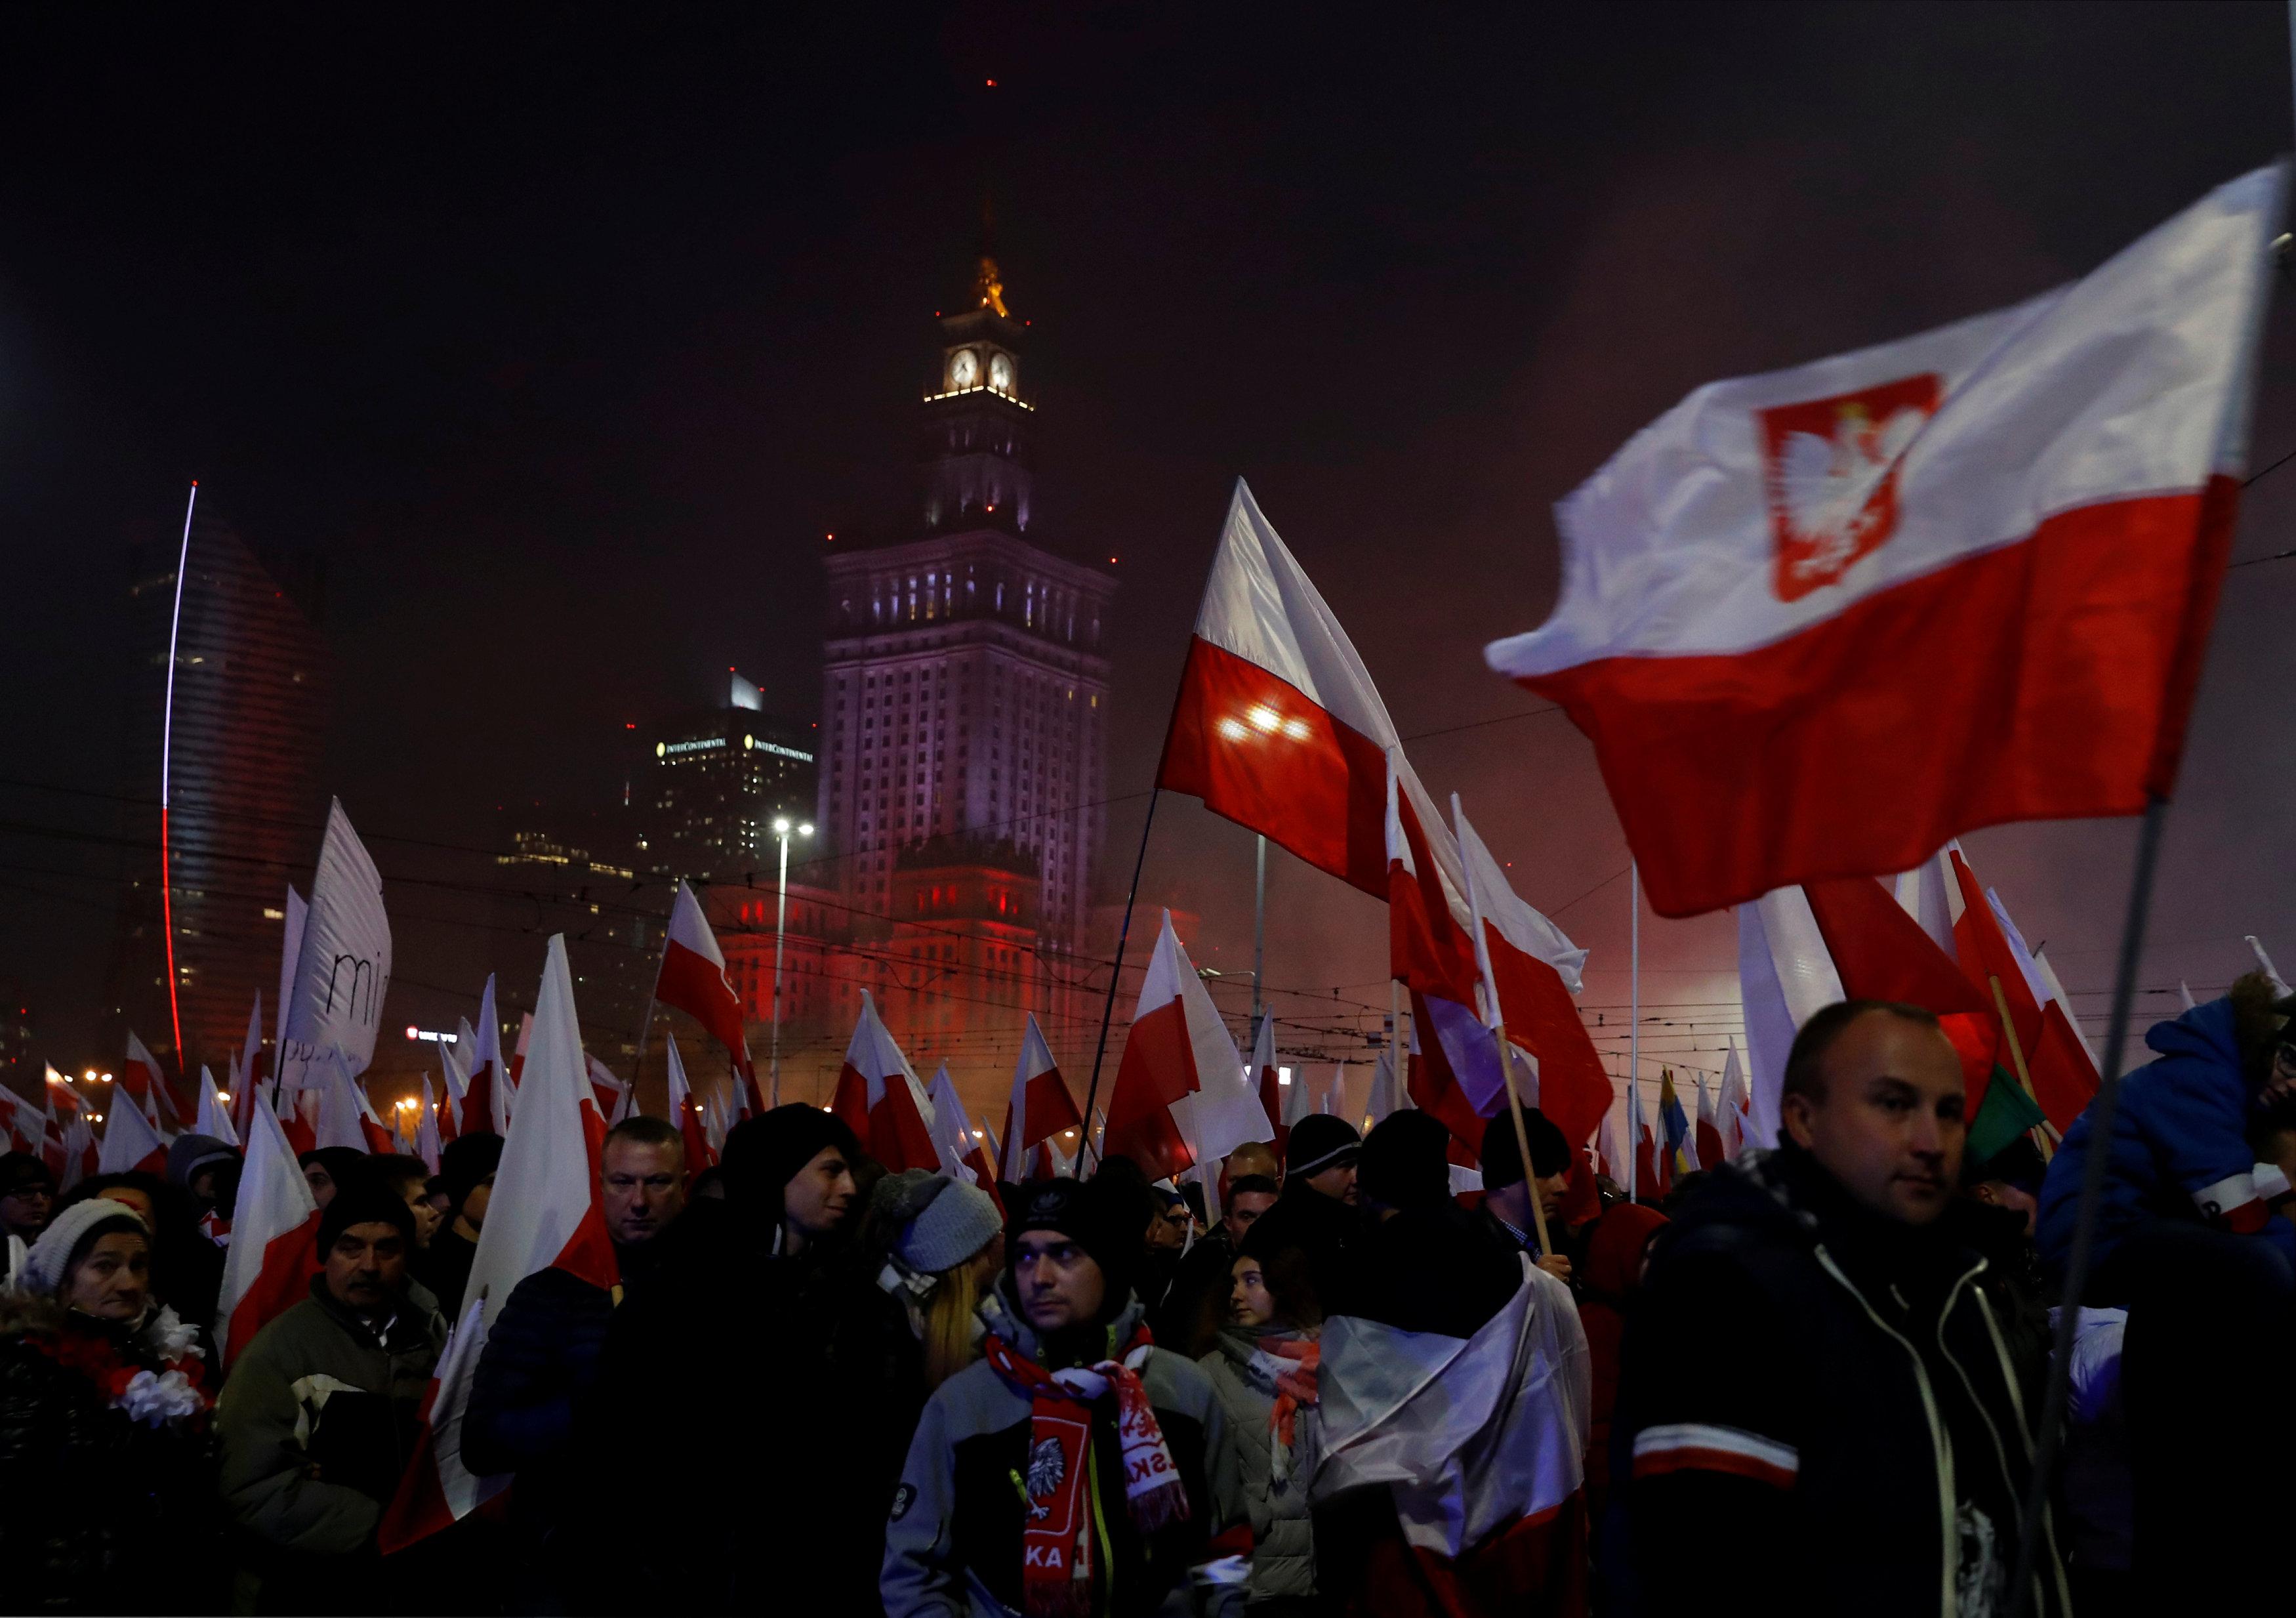 marš ekstremnih desničara, fašisti, neonacisti, Poljska, Varšava, Foto Reuters